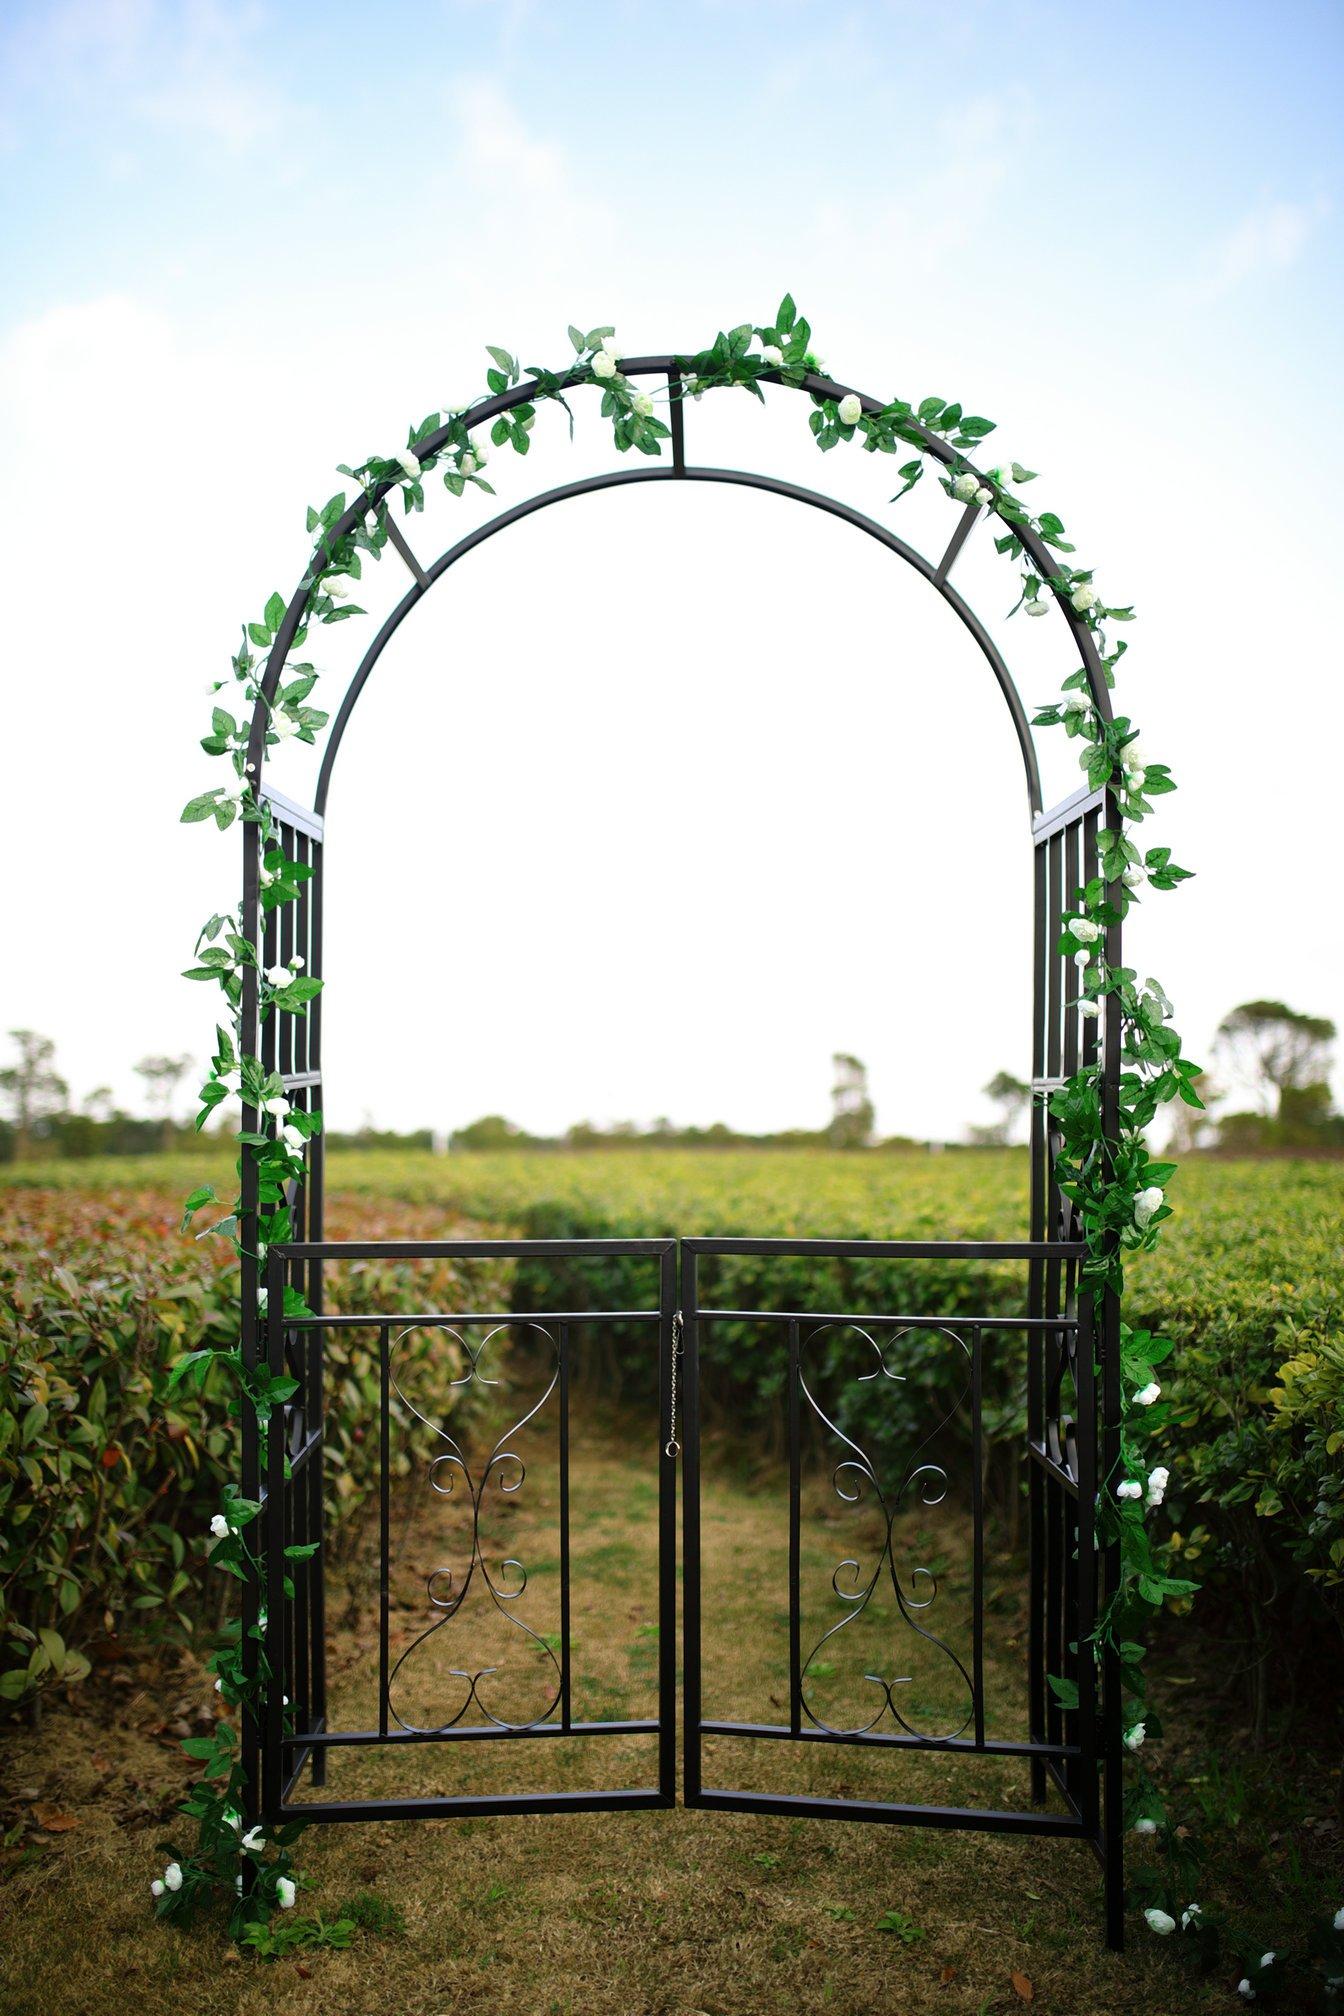 1. GO Steel Garden Arch with Gate, 6'7'' High x 3'7'' Wide, Garden Arbor for Various Climbing Plant, Outdoor Garden Lawn Backyard by 1. GO (Image #3)